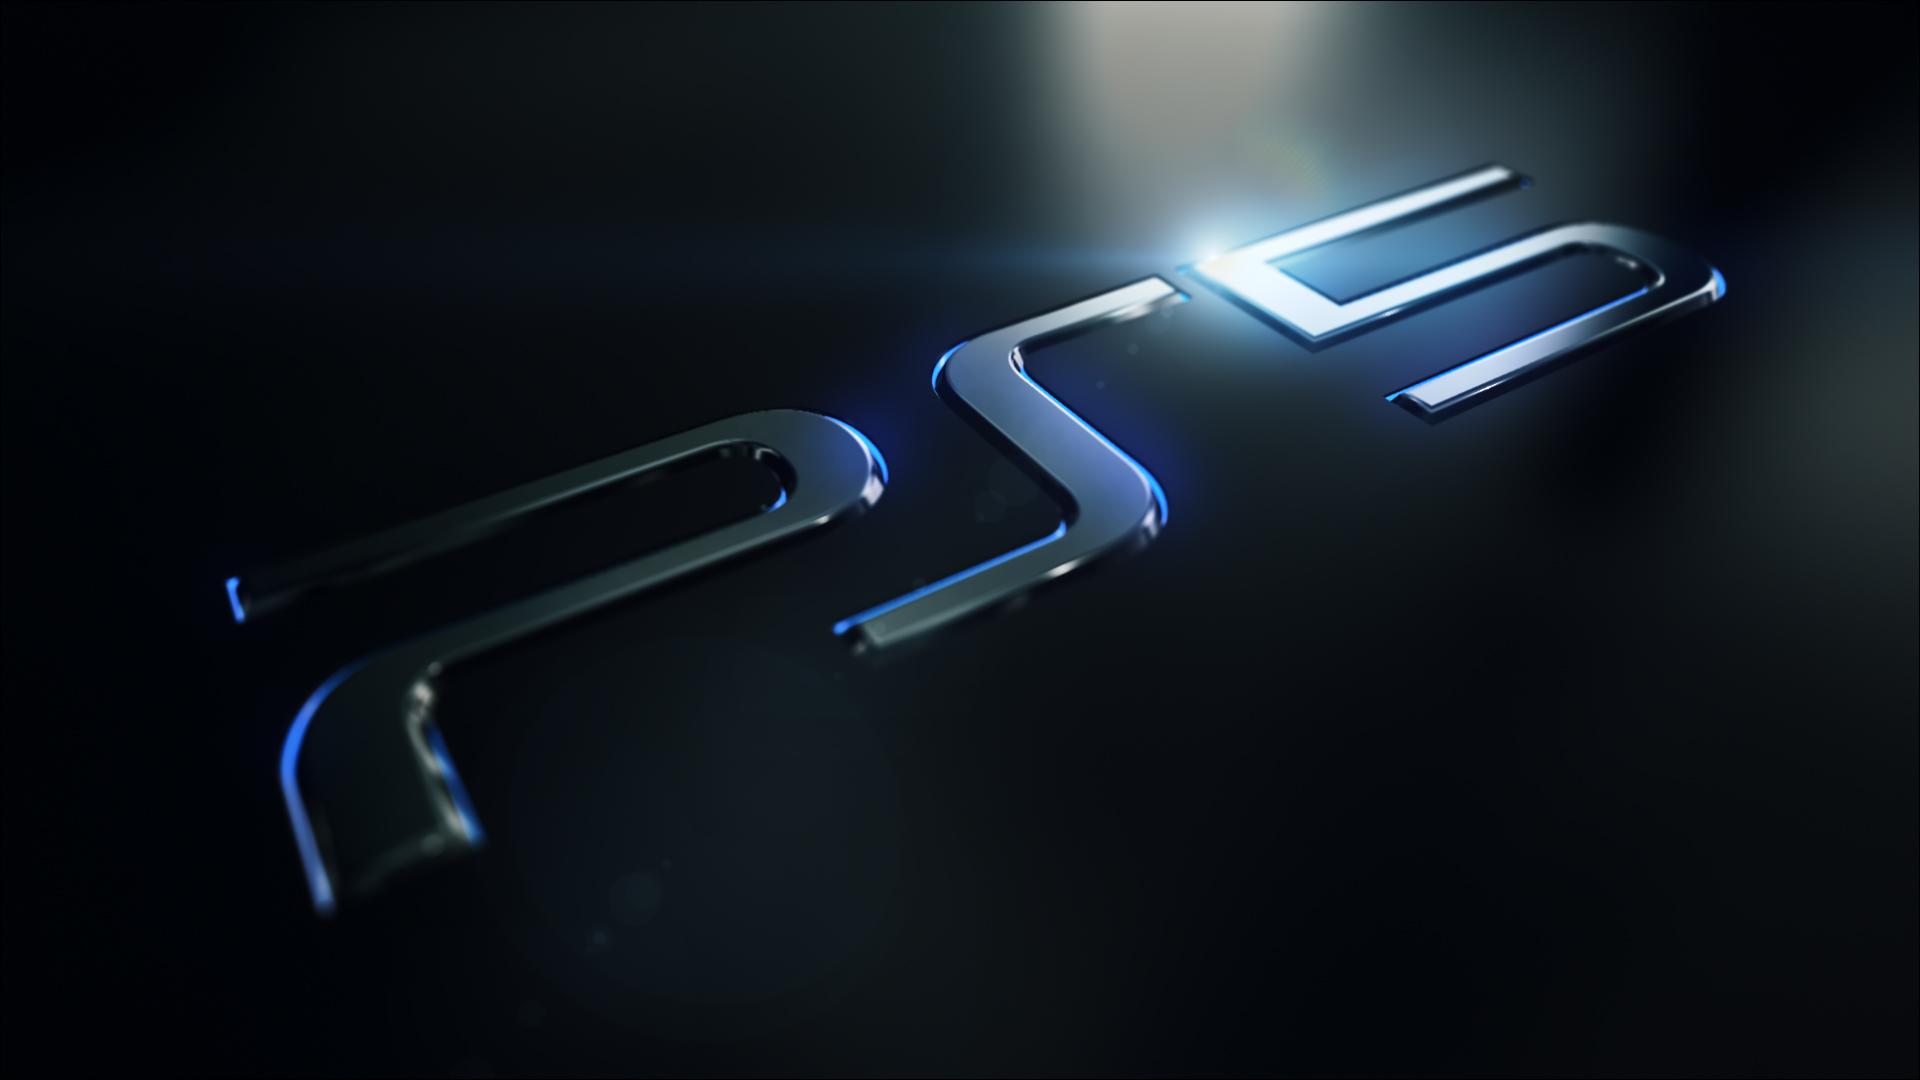 Ps5 Price Bundle Deals   Playstation 5 Hd   1920x1080 Wallpaper 1920x1080